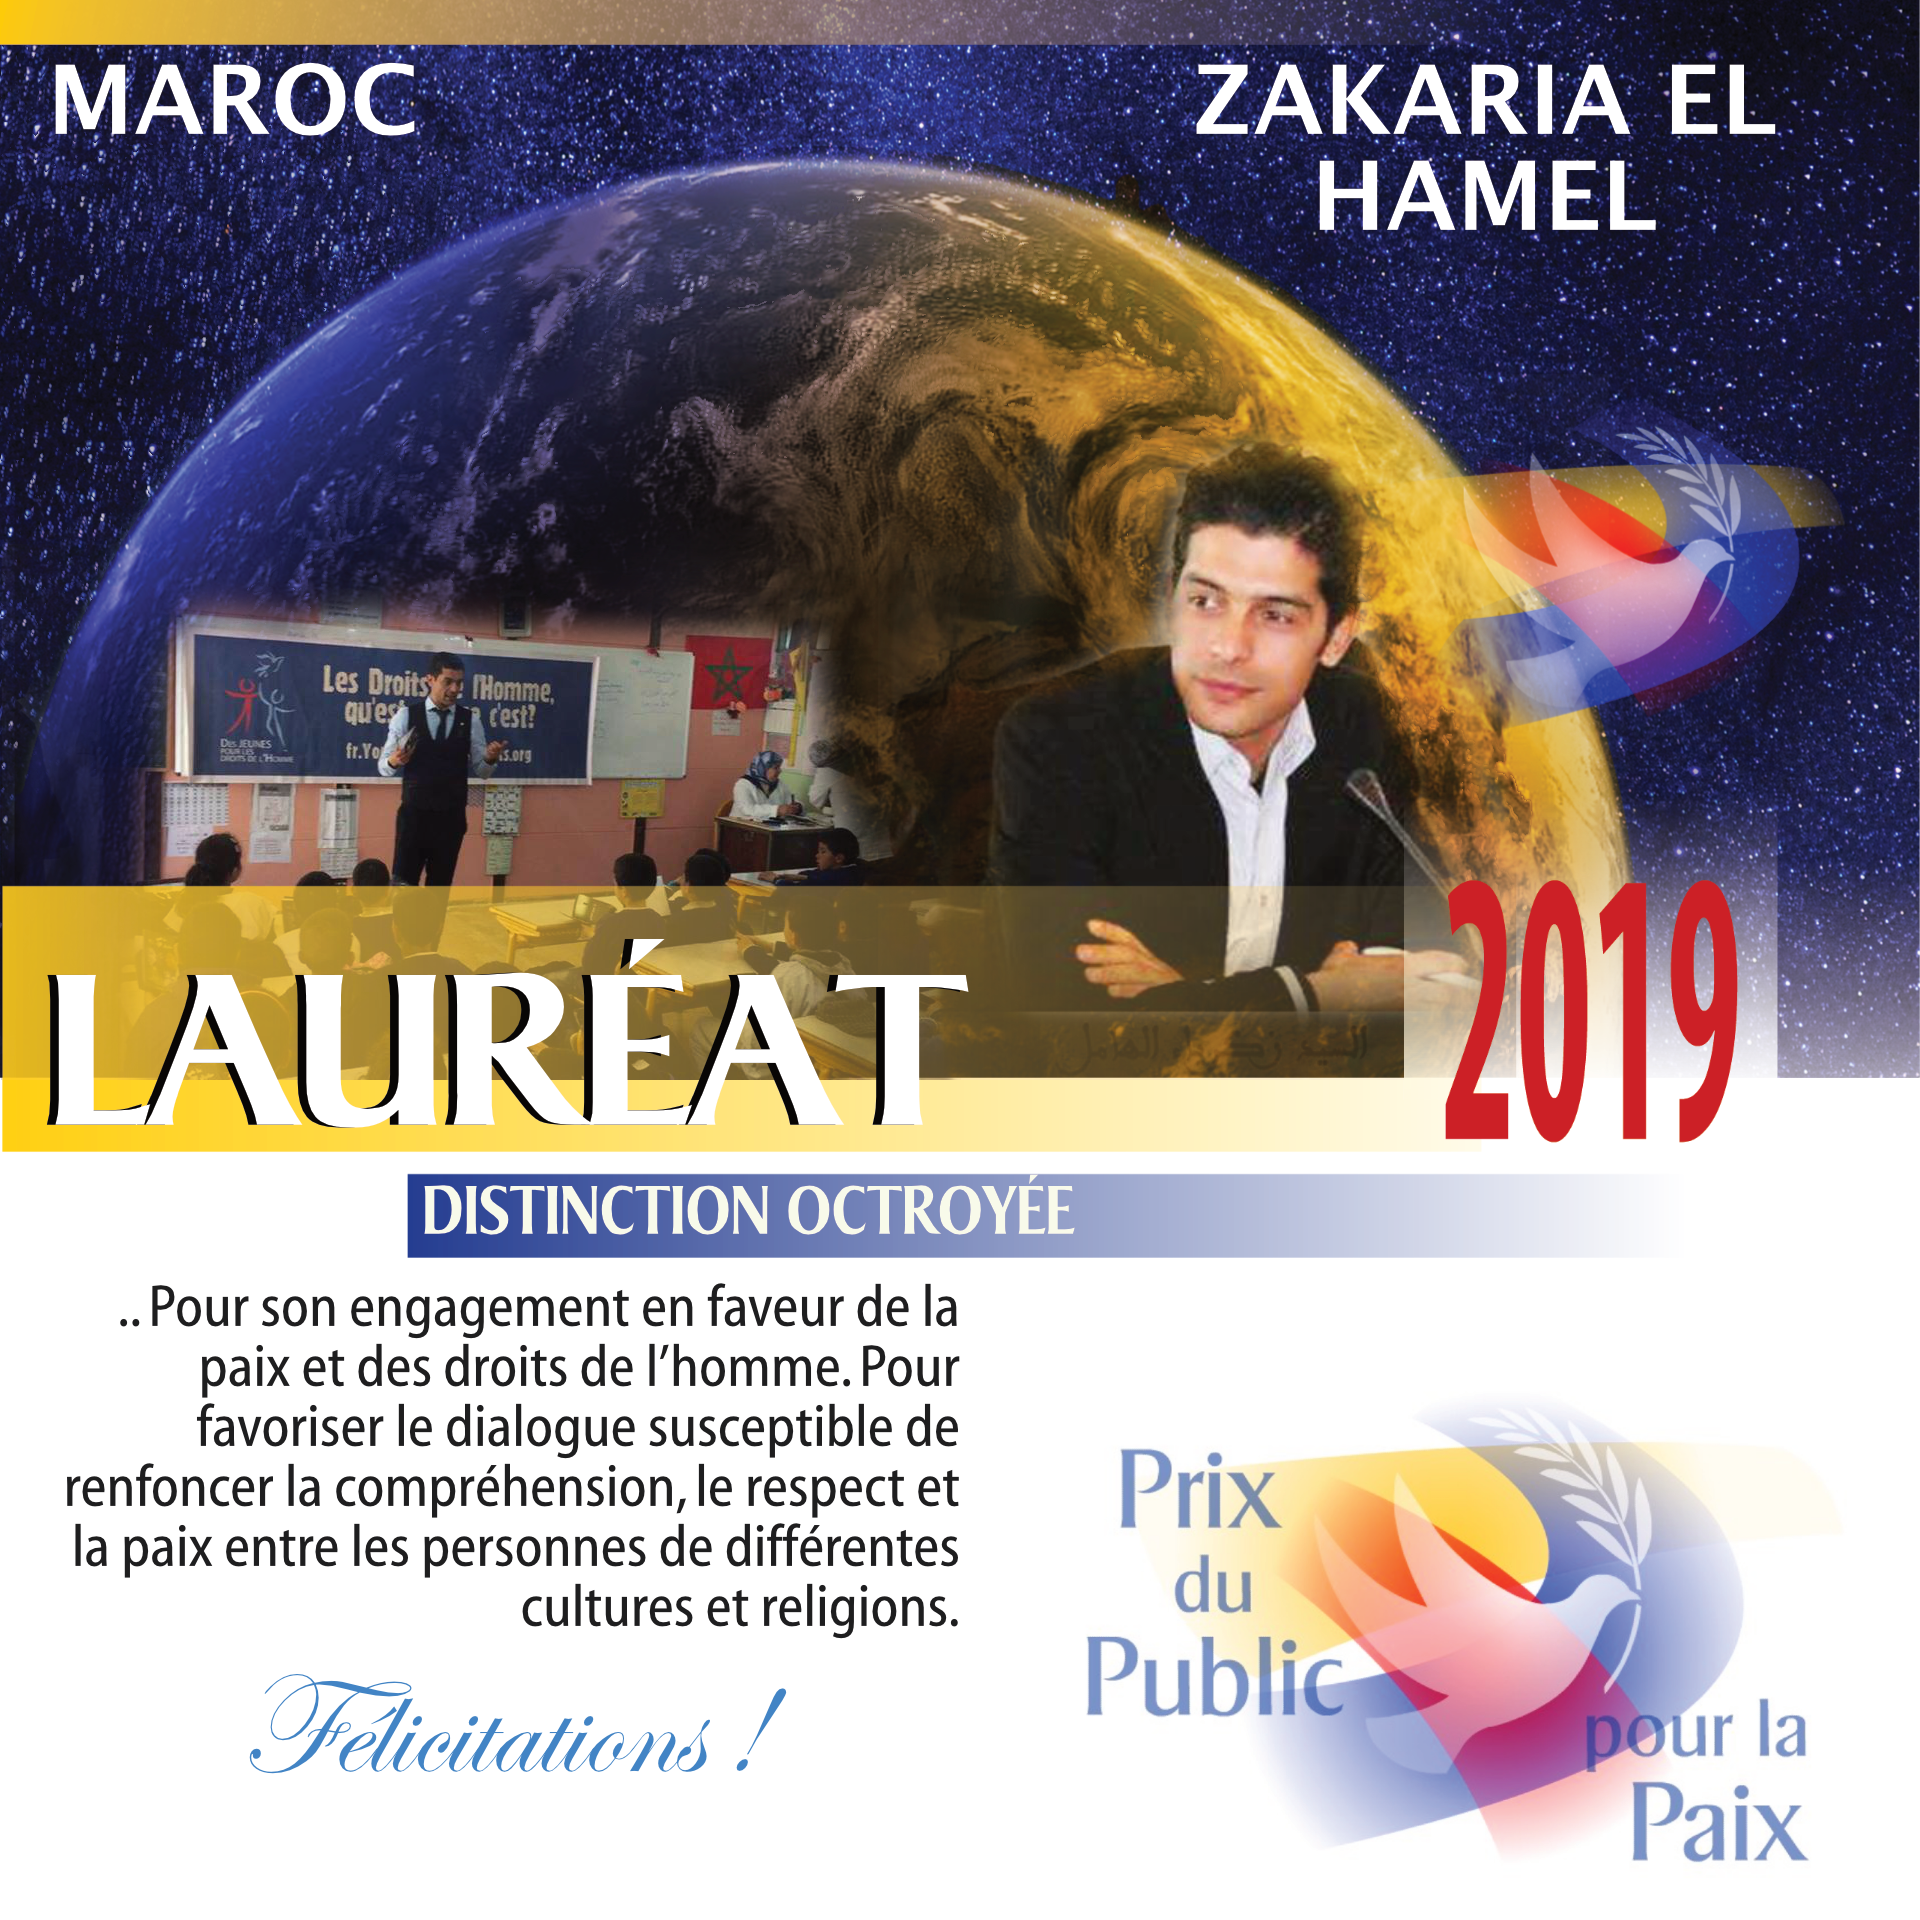 lau5-zakaria